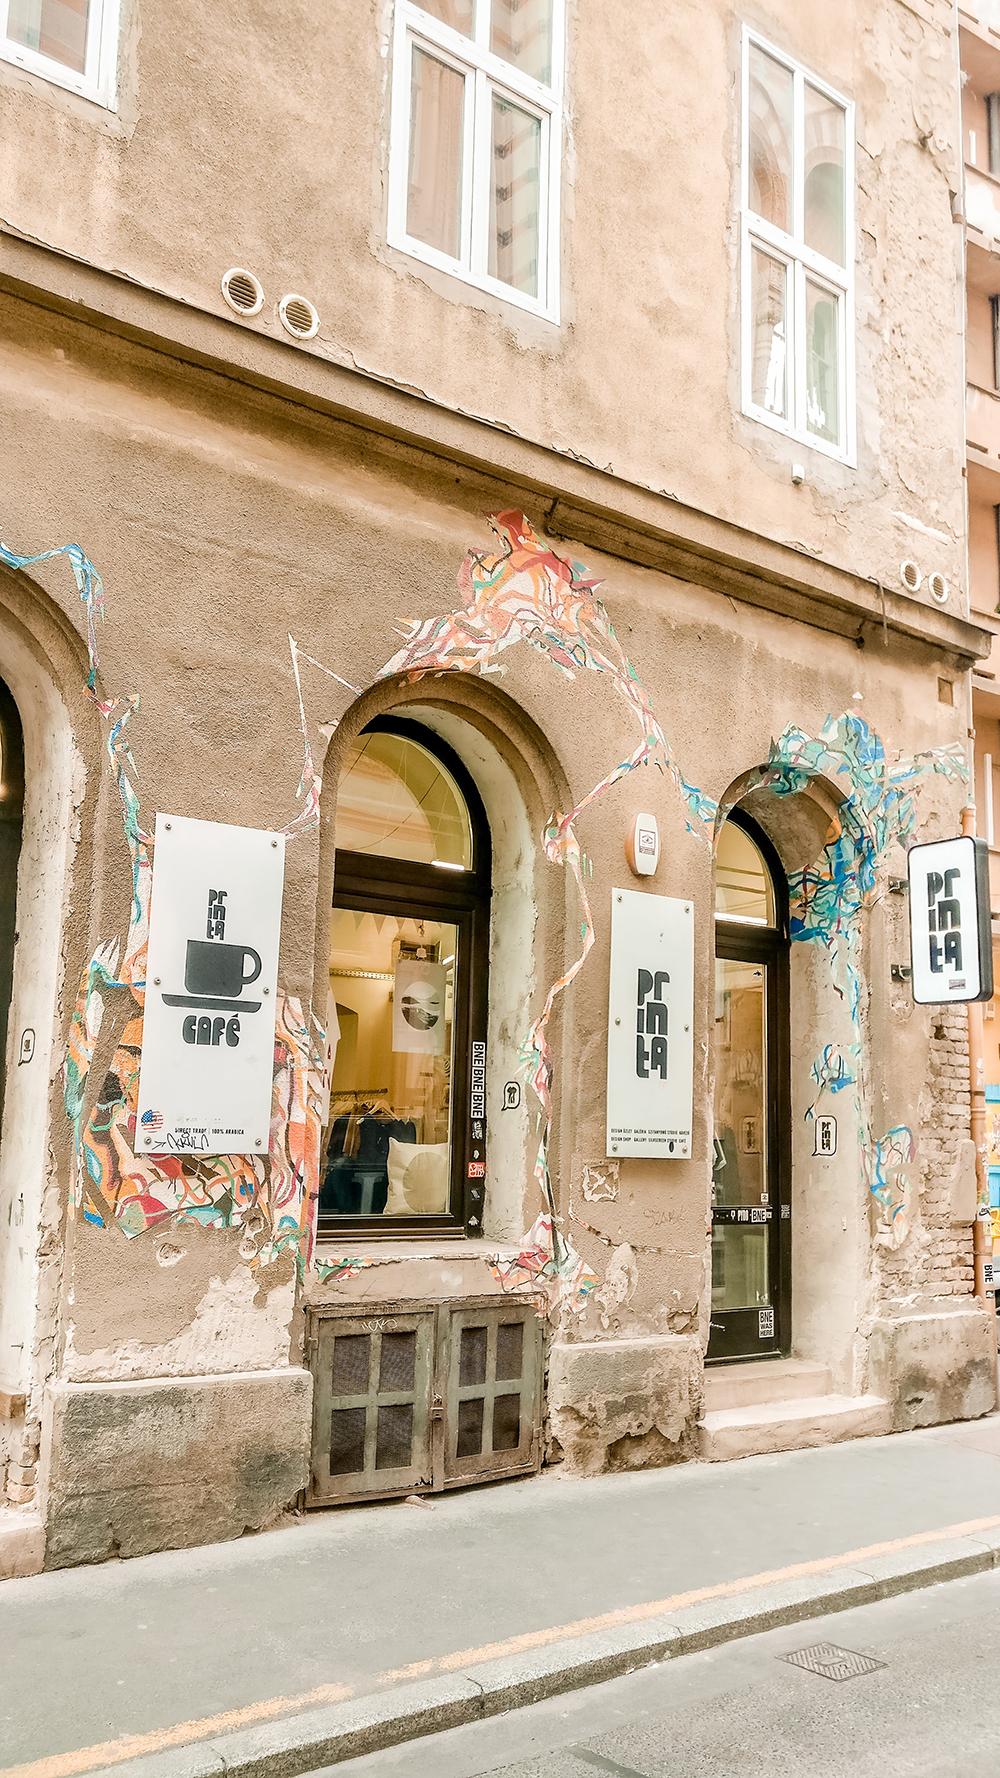 Printa Design Shop - Budapest design shop guide to best Hungarian souvenirs | Aliz's Wonderland